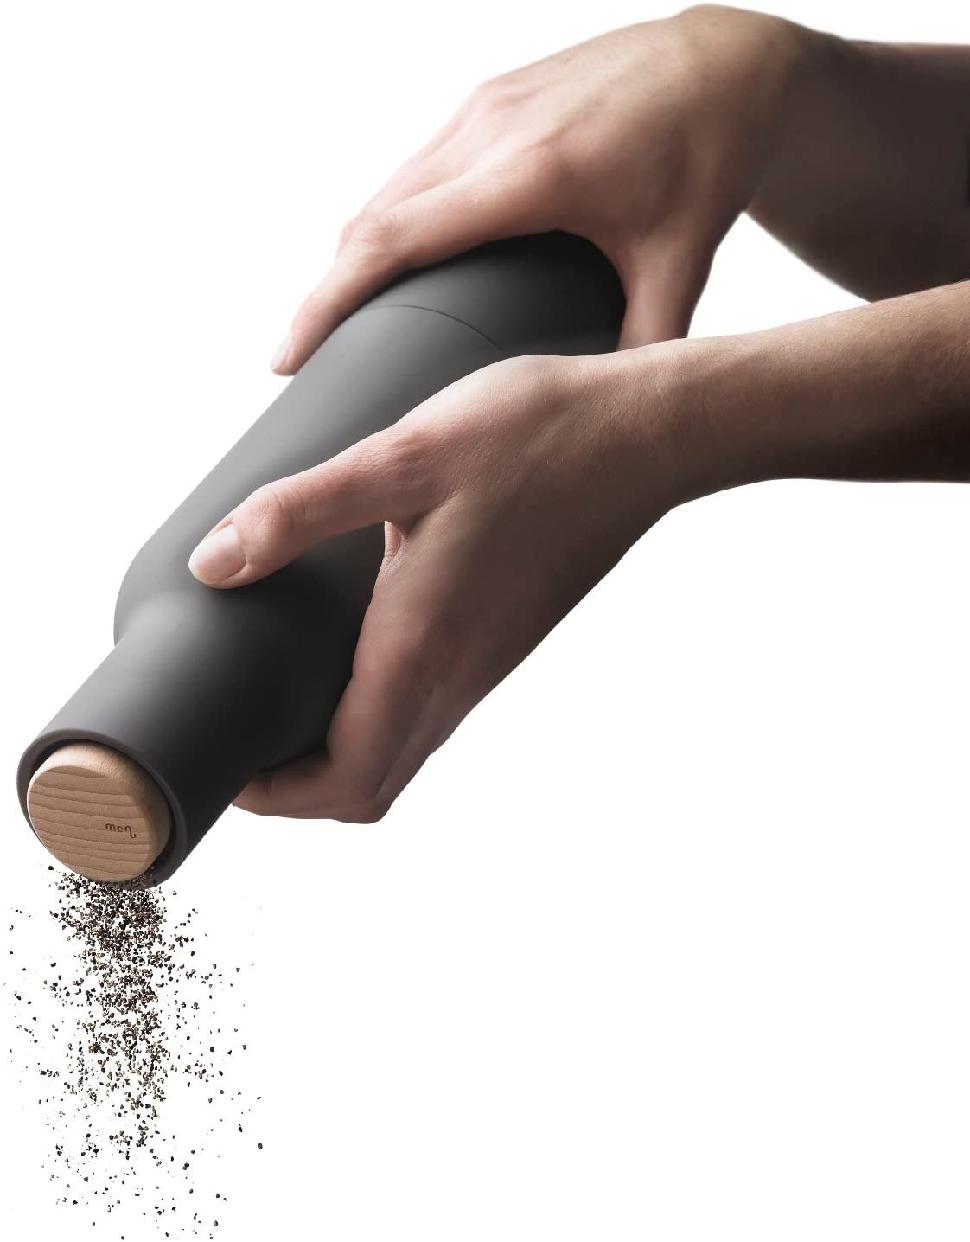 MENU(メニュー)ボトルグラインダーの商品画像3